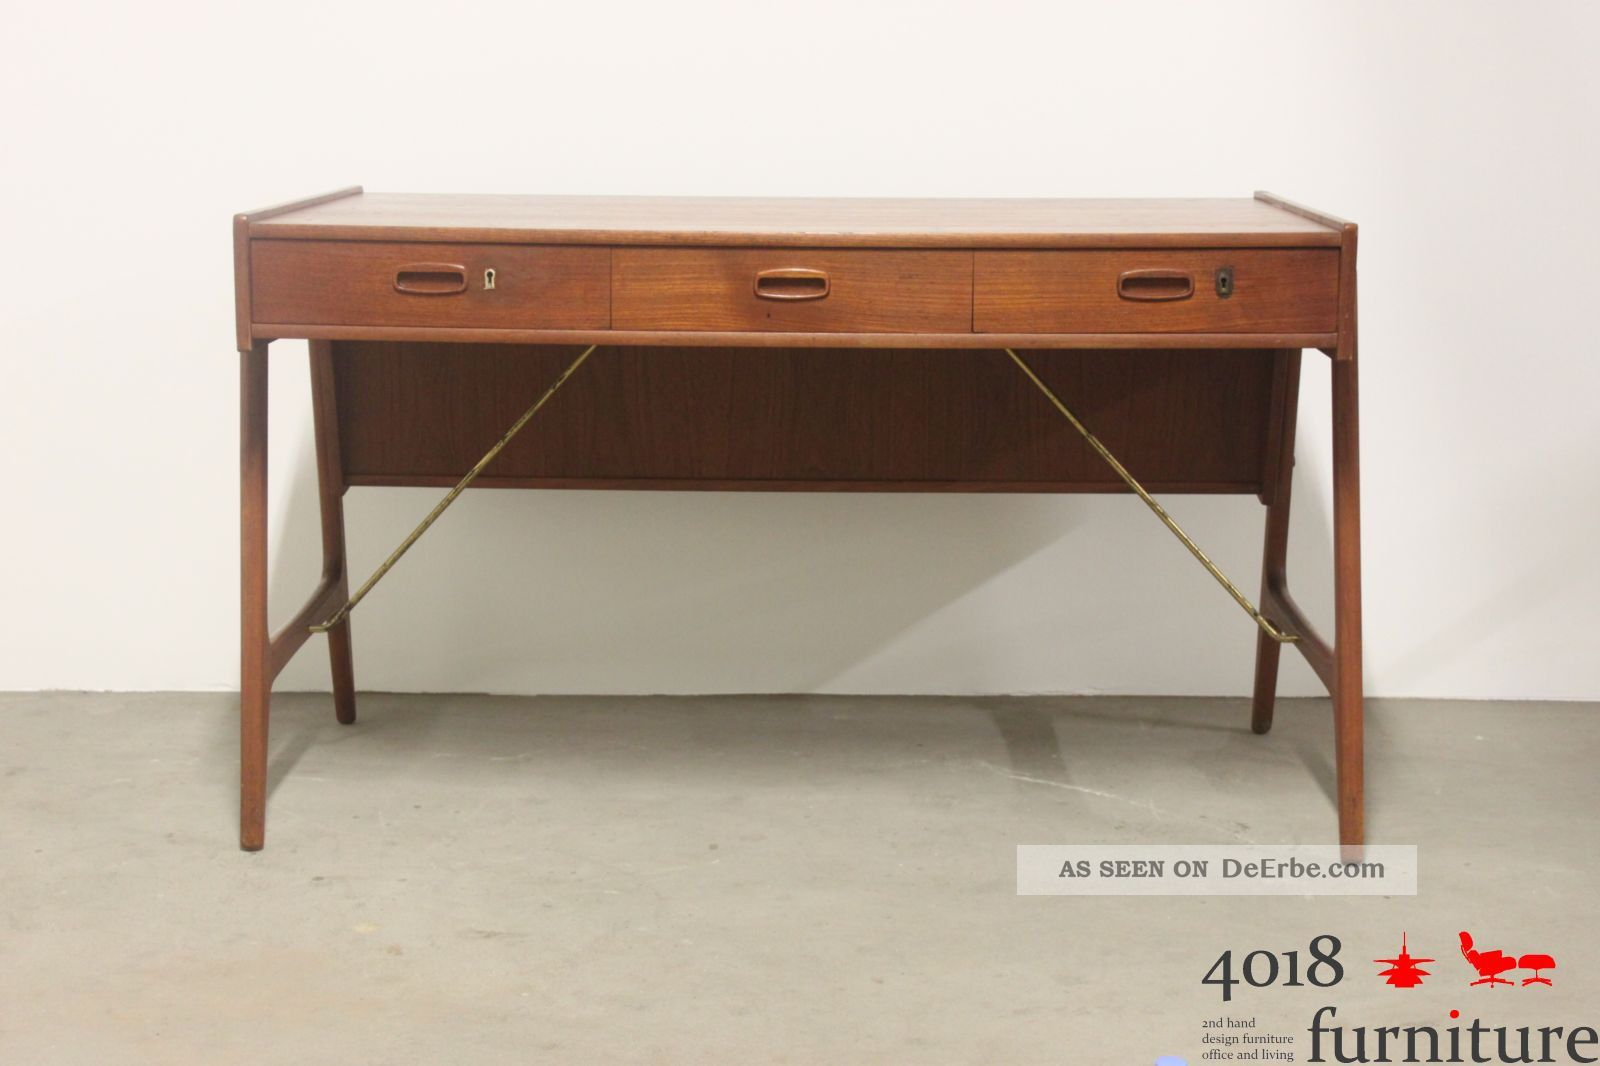 teak schreibtisch danish desk 50s 60s midcentury design. Black Bedroom Furniture Sets. Home Design Ideas